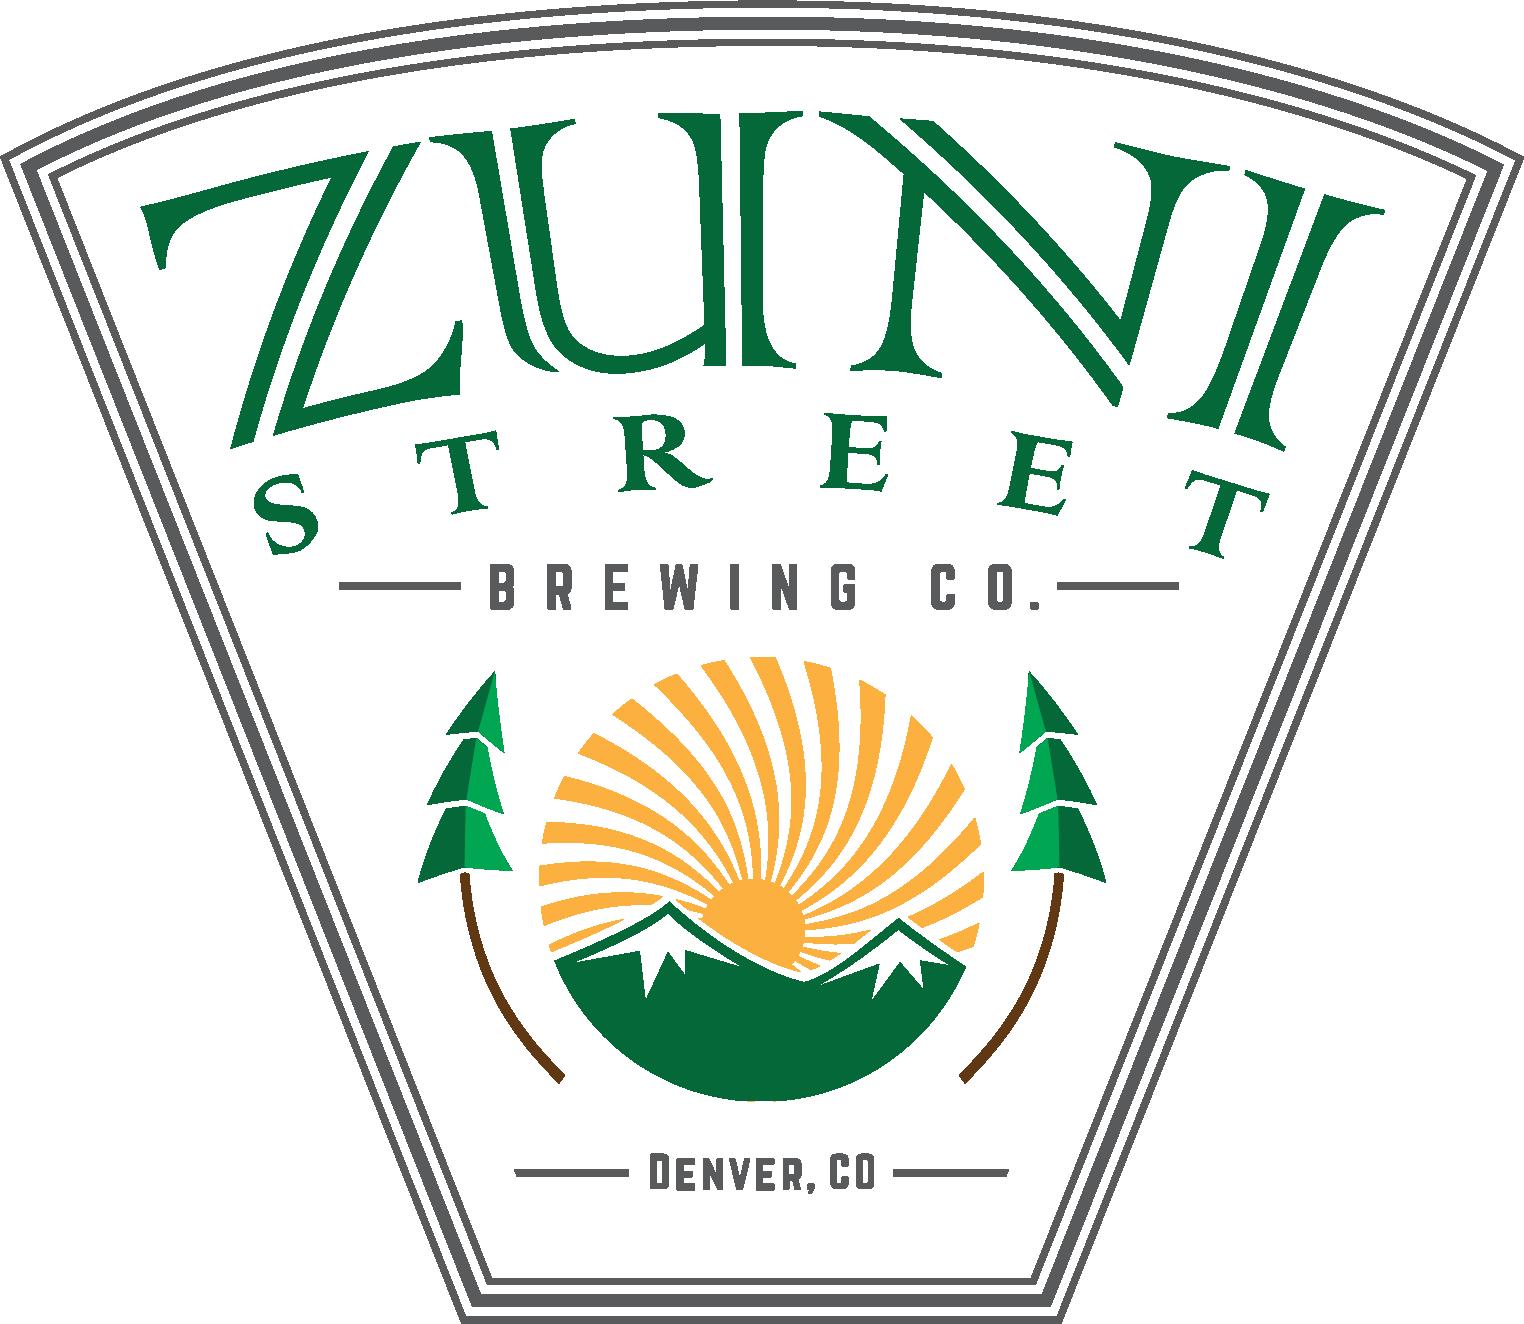 Zuni-Street-Brewing-Co-Logo-Final-Color.png